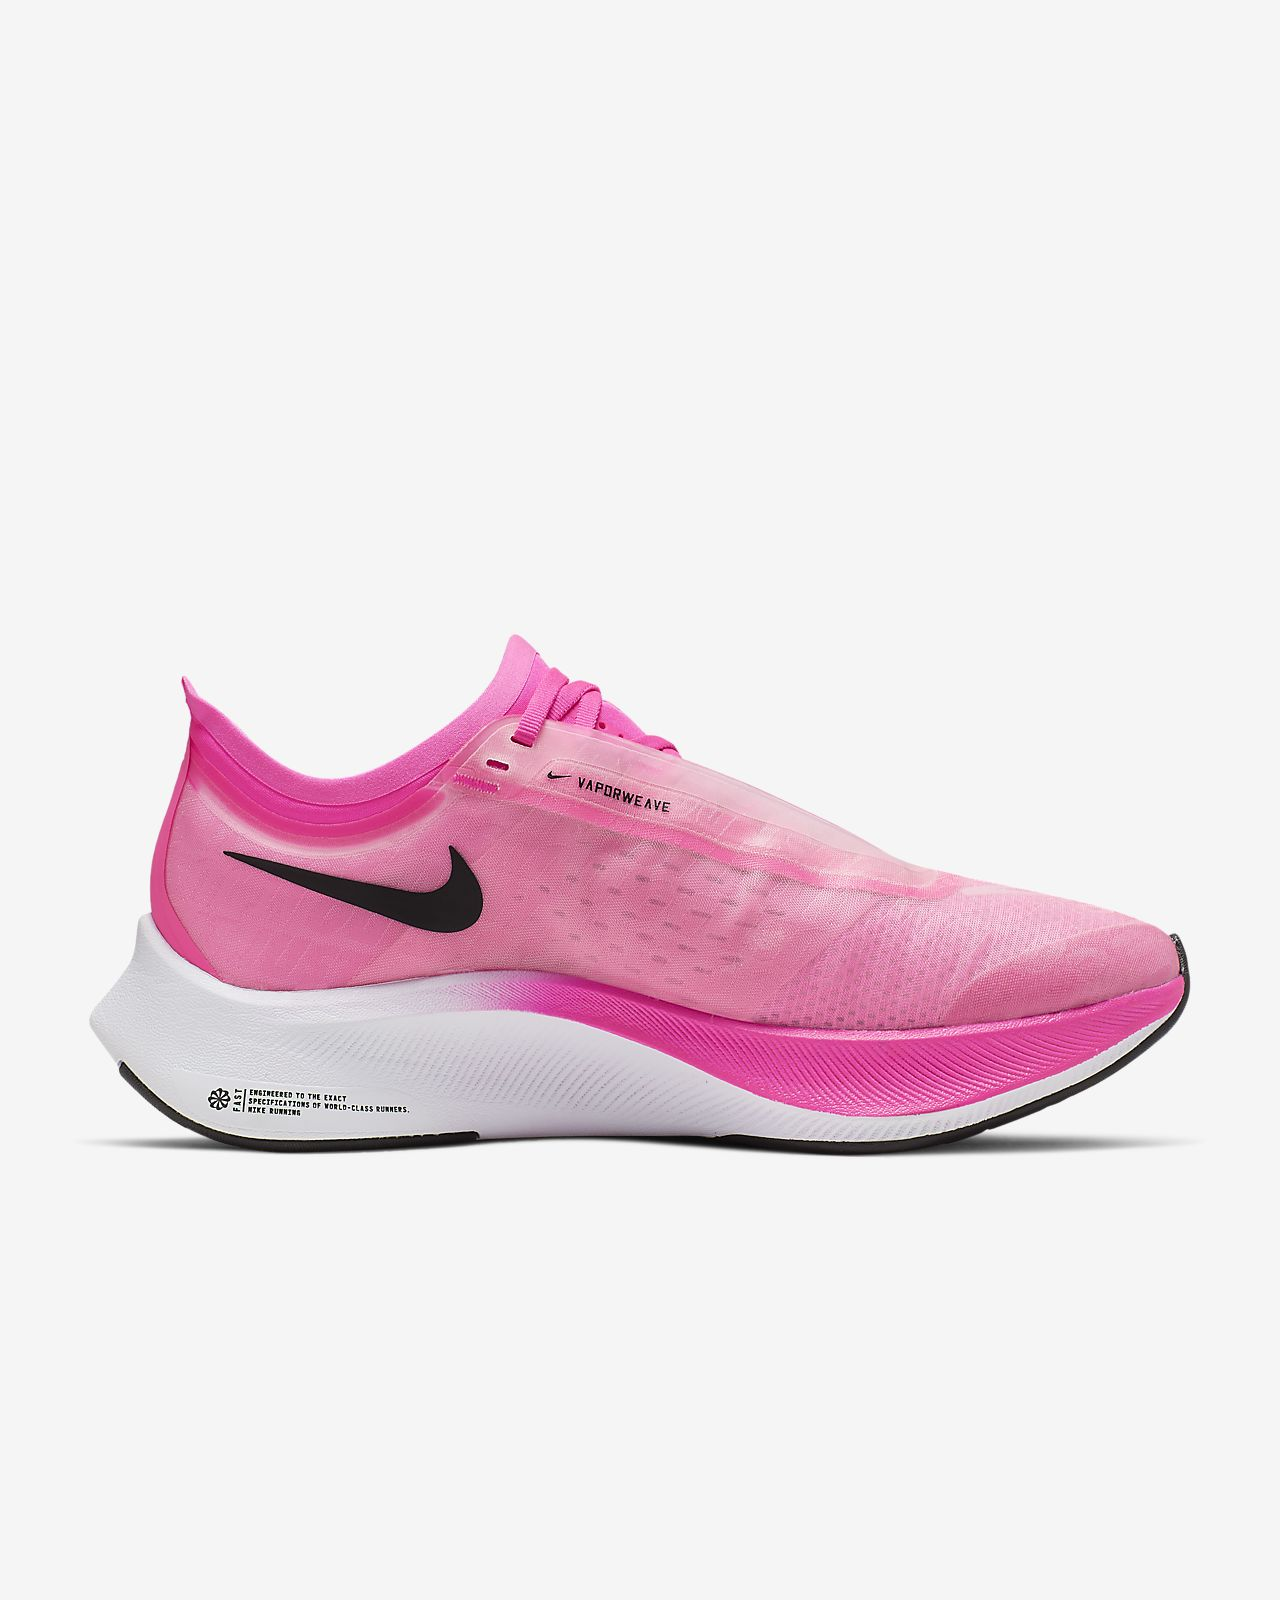 Nike Air Max Damenlaufschuh Charcoal Orange Pink Für Frauen